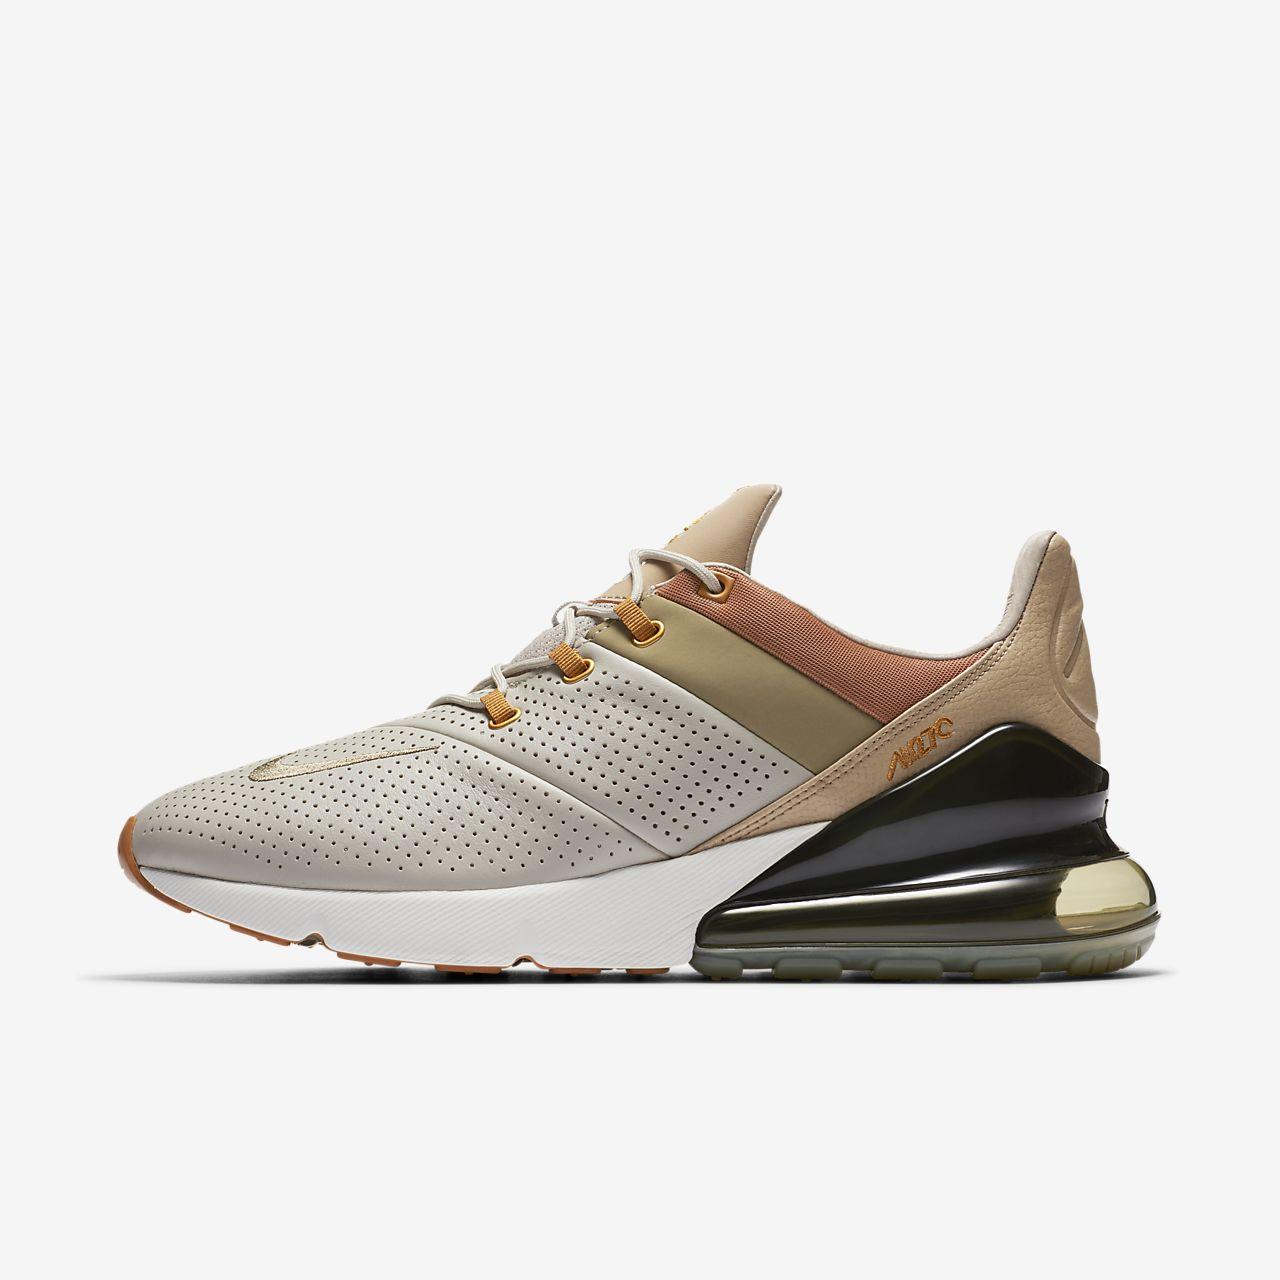 2c574f9c9 Мужские кроссовки Nike Air Max 270 Premium. Nike.com RU